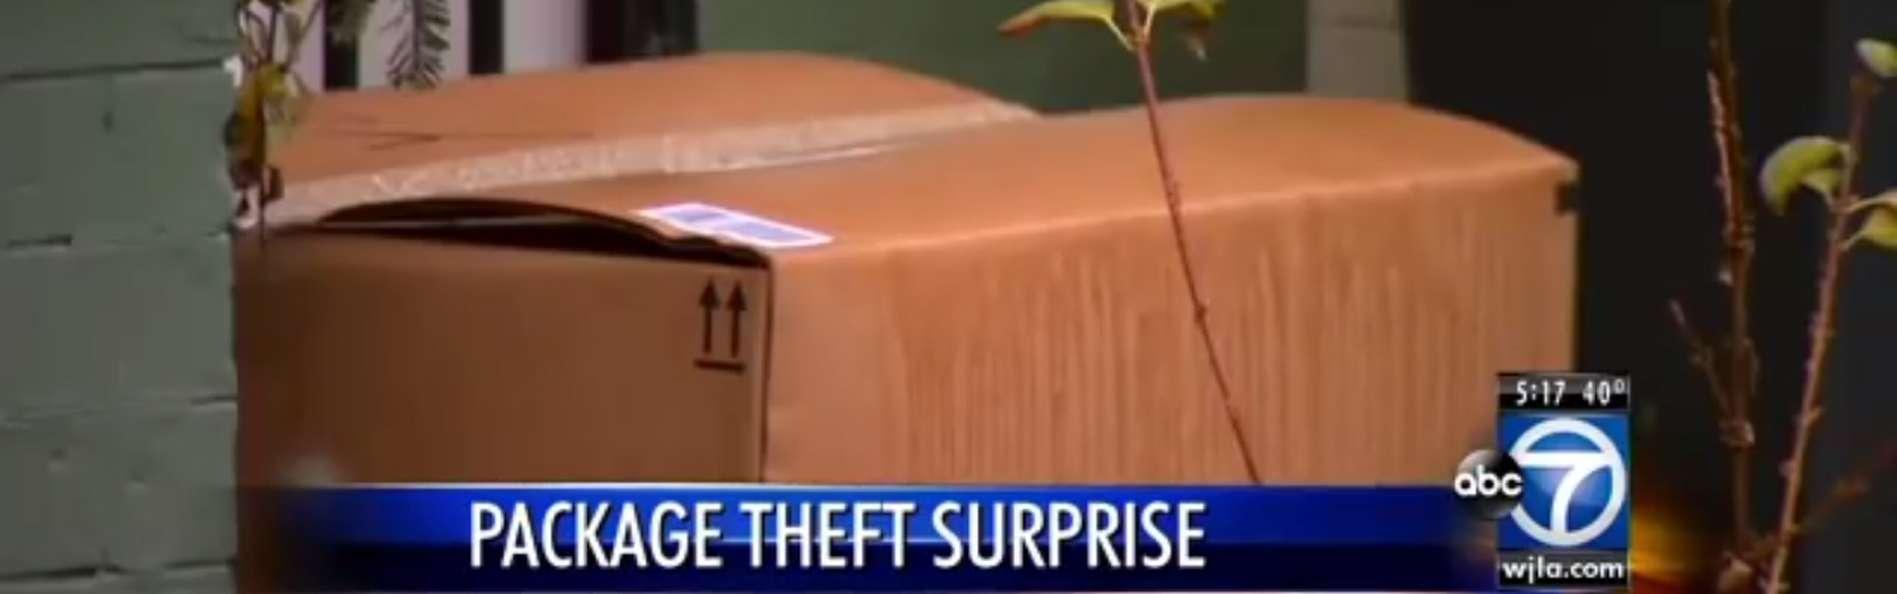 Paquete sorpresa. Foto: Youtube.com